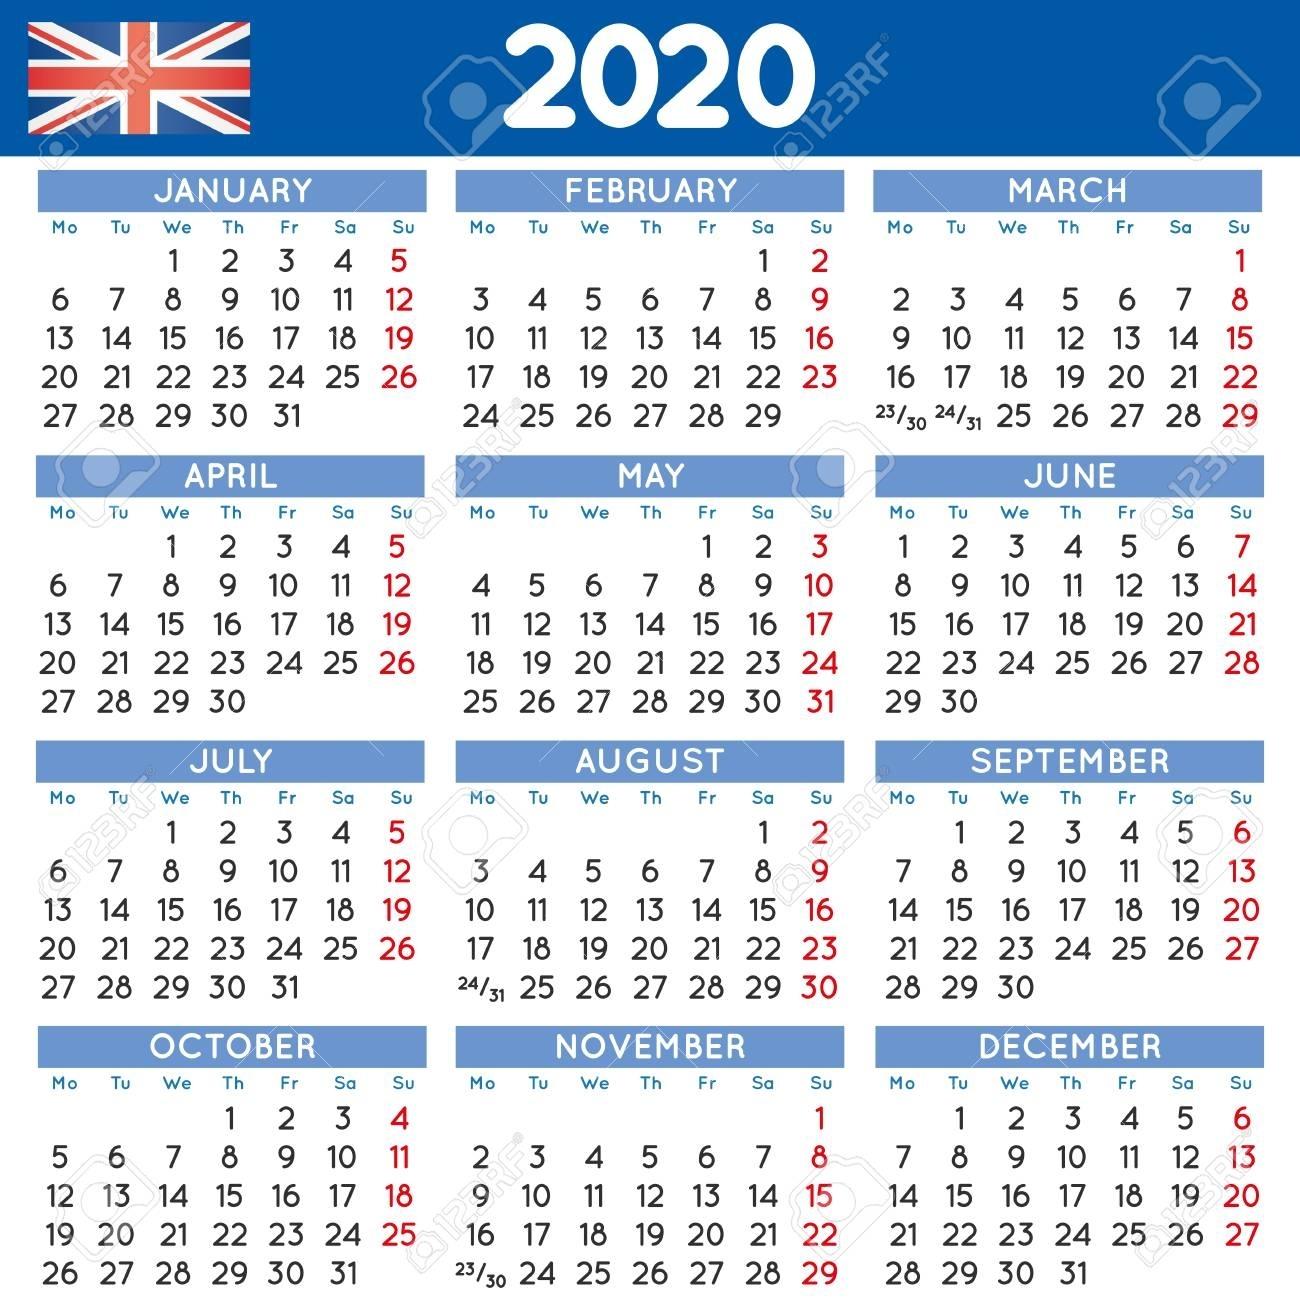 2020 Elegant Squared Calendar English Uk. Year 2020 Calendar